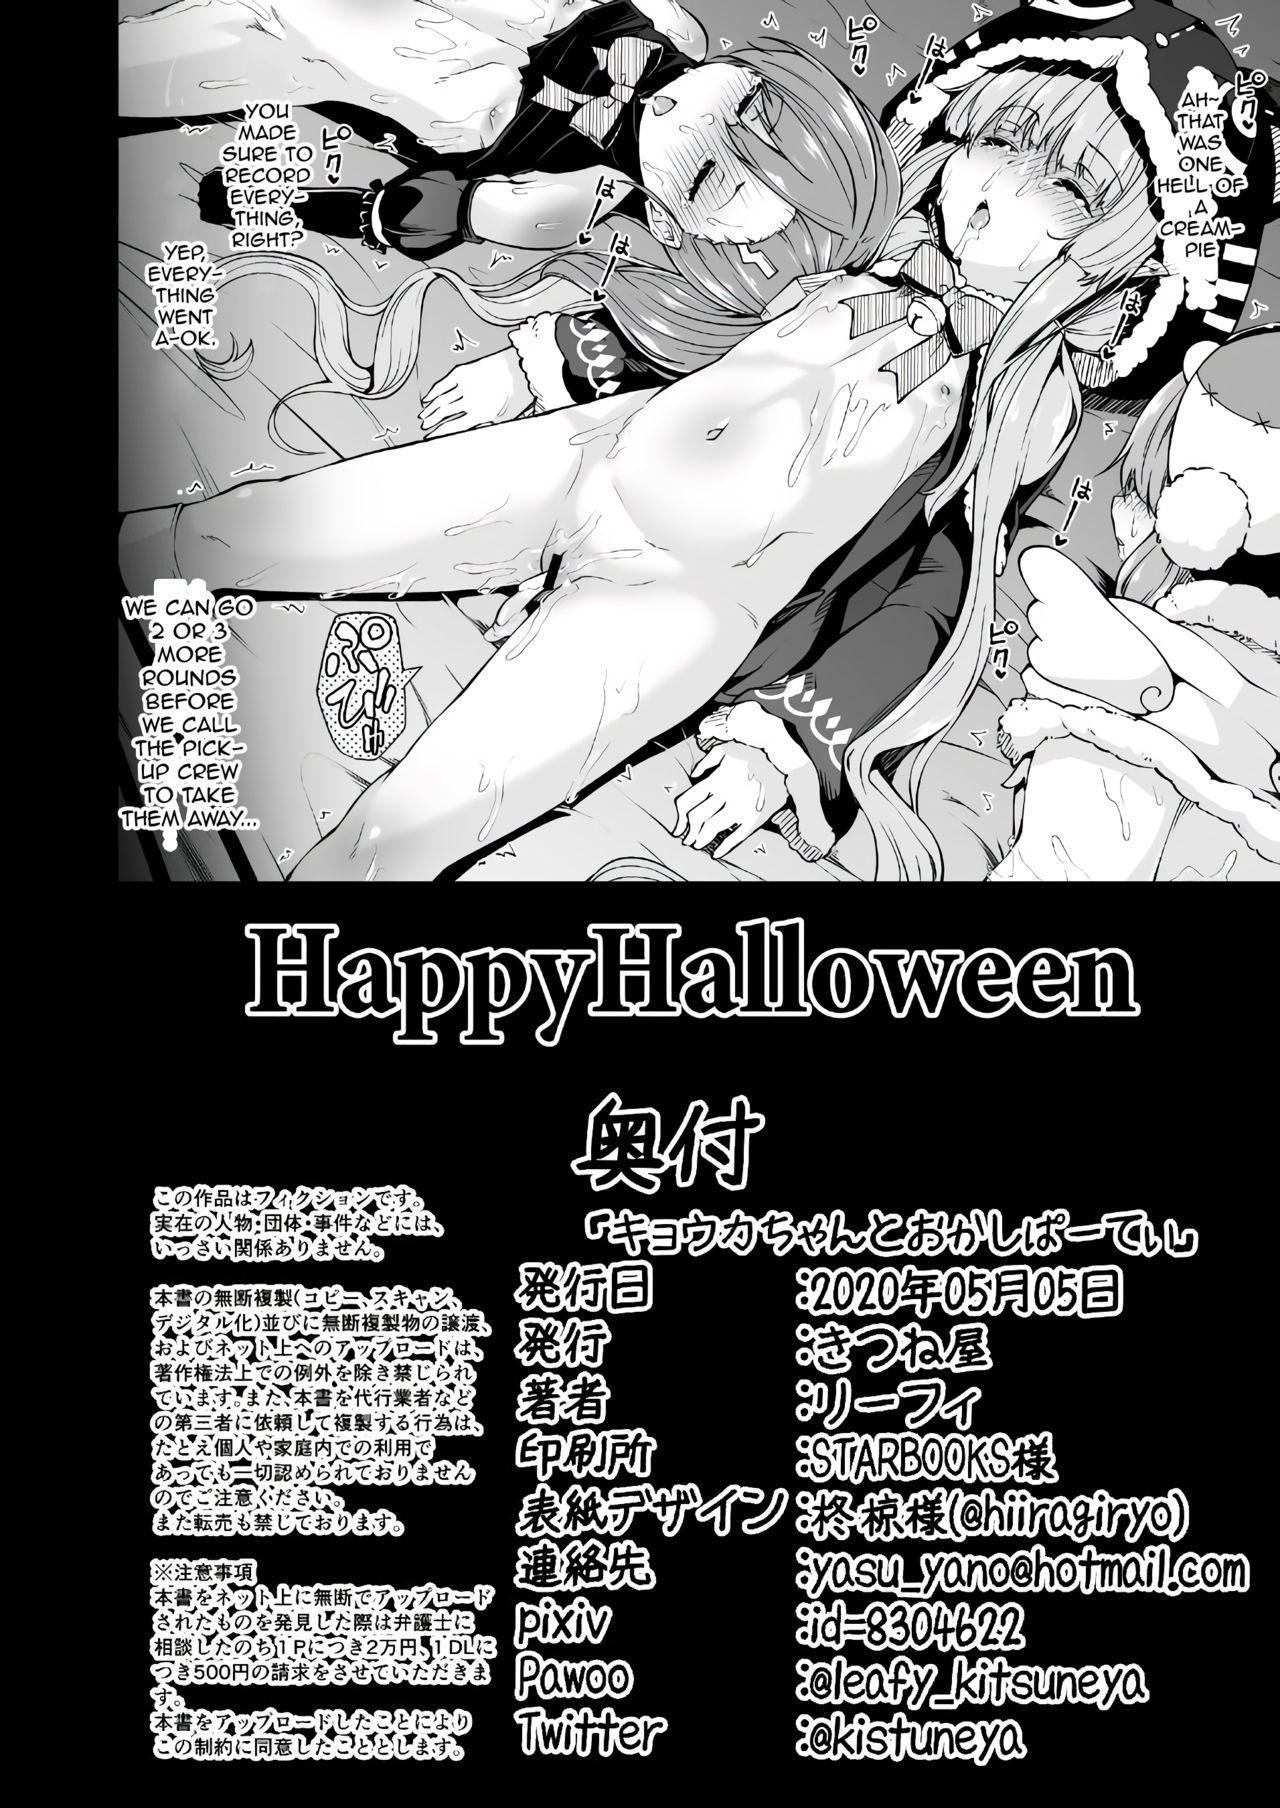 [Kitsuneya (Leafy)] Kyouka-chan to Okashi Party | Candy Party with Kyouka-chan (Princess Connect! Re:Dive) [English] [denialinred] [Digital] 28